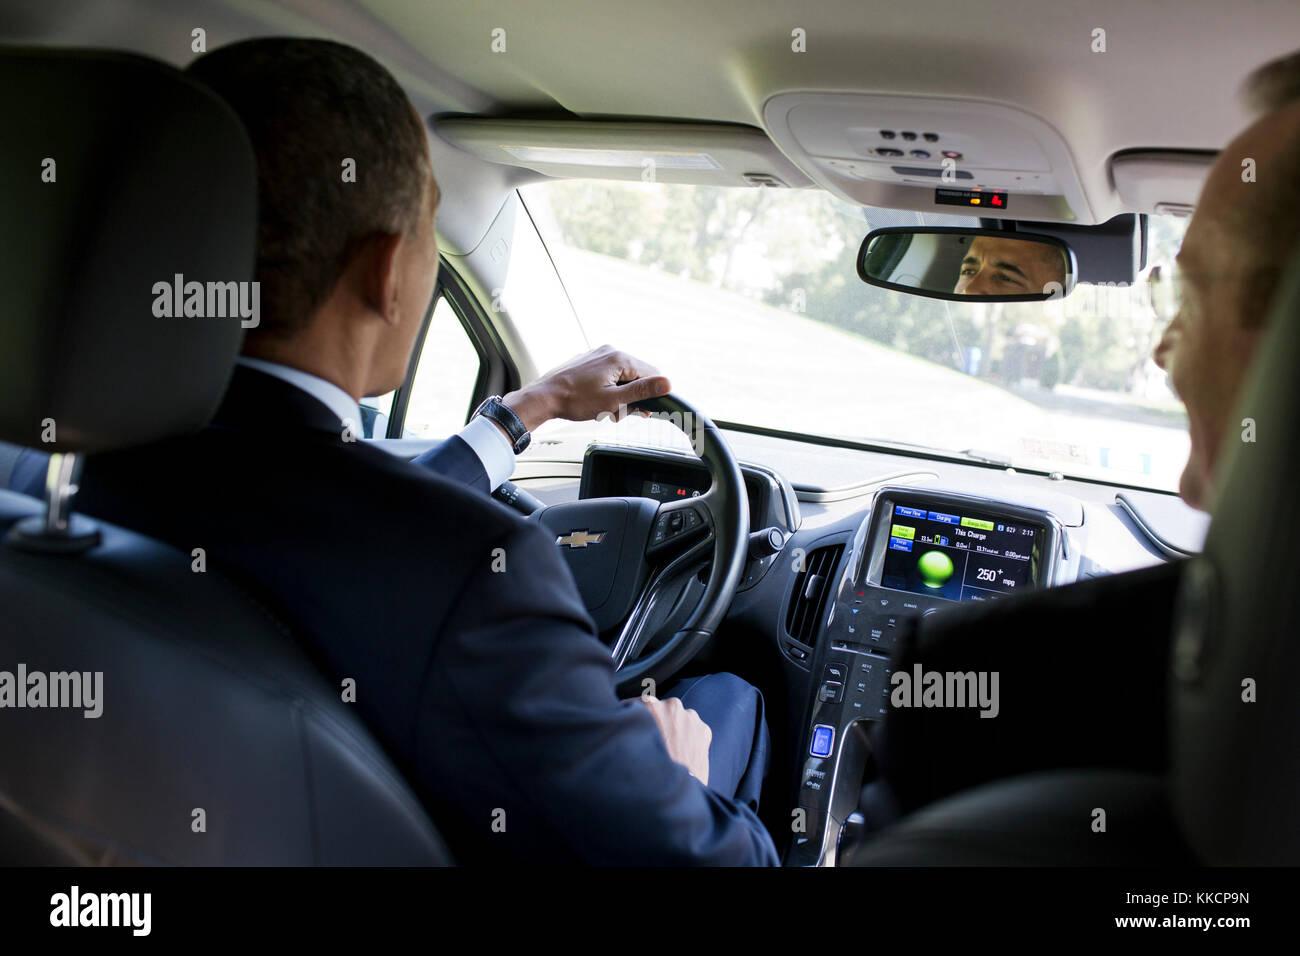 obama meet the press 2012 chevy